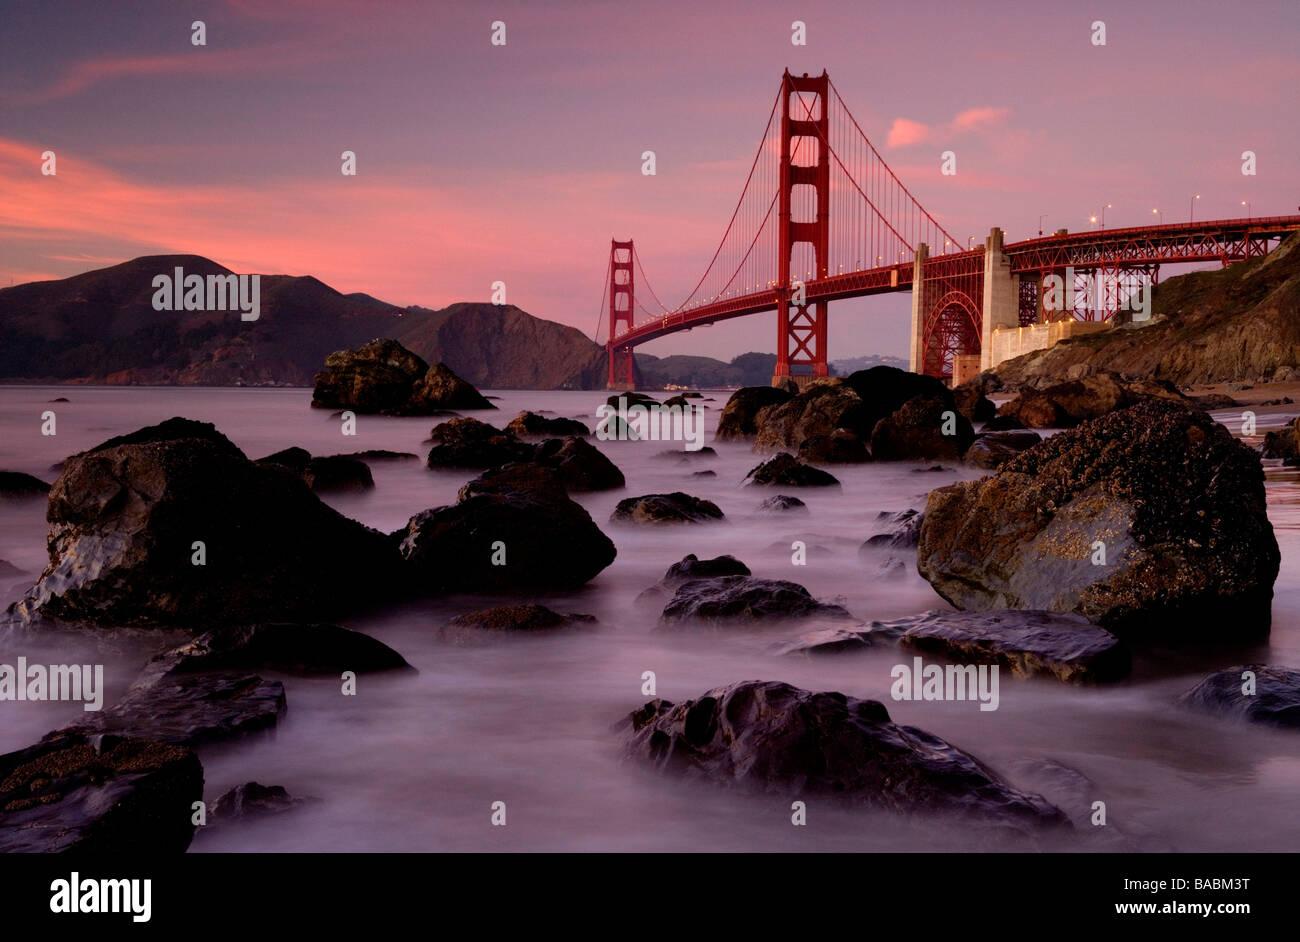 Golden Gate Brücke gesehen von Baker Beach bei Sonnenuntergang, San Francisco, USA. Stockbild